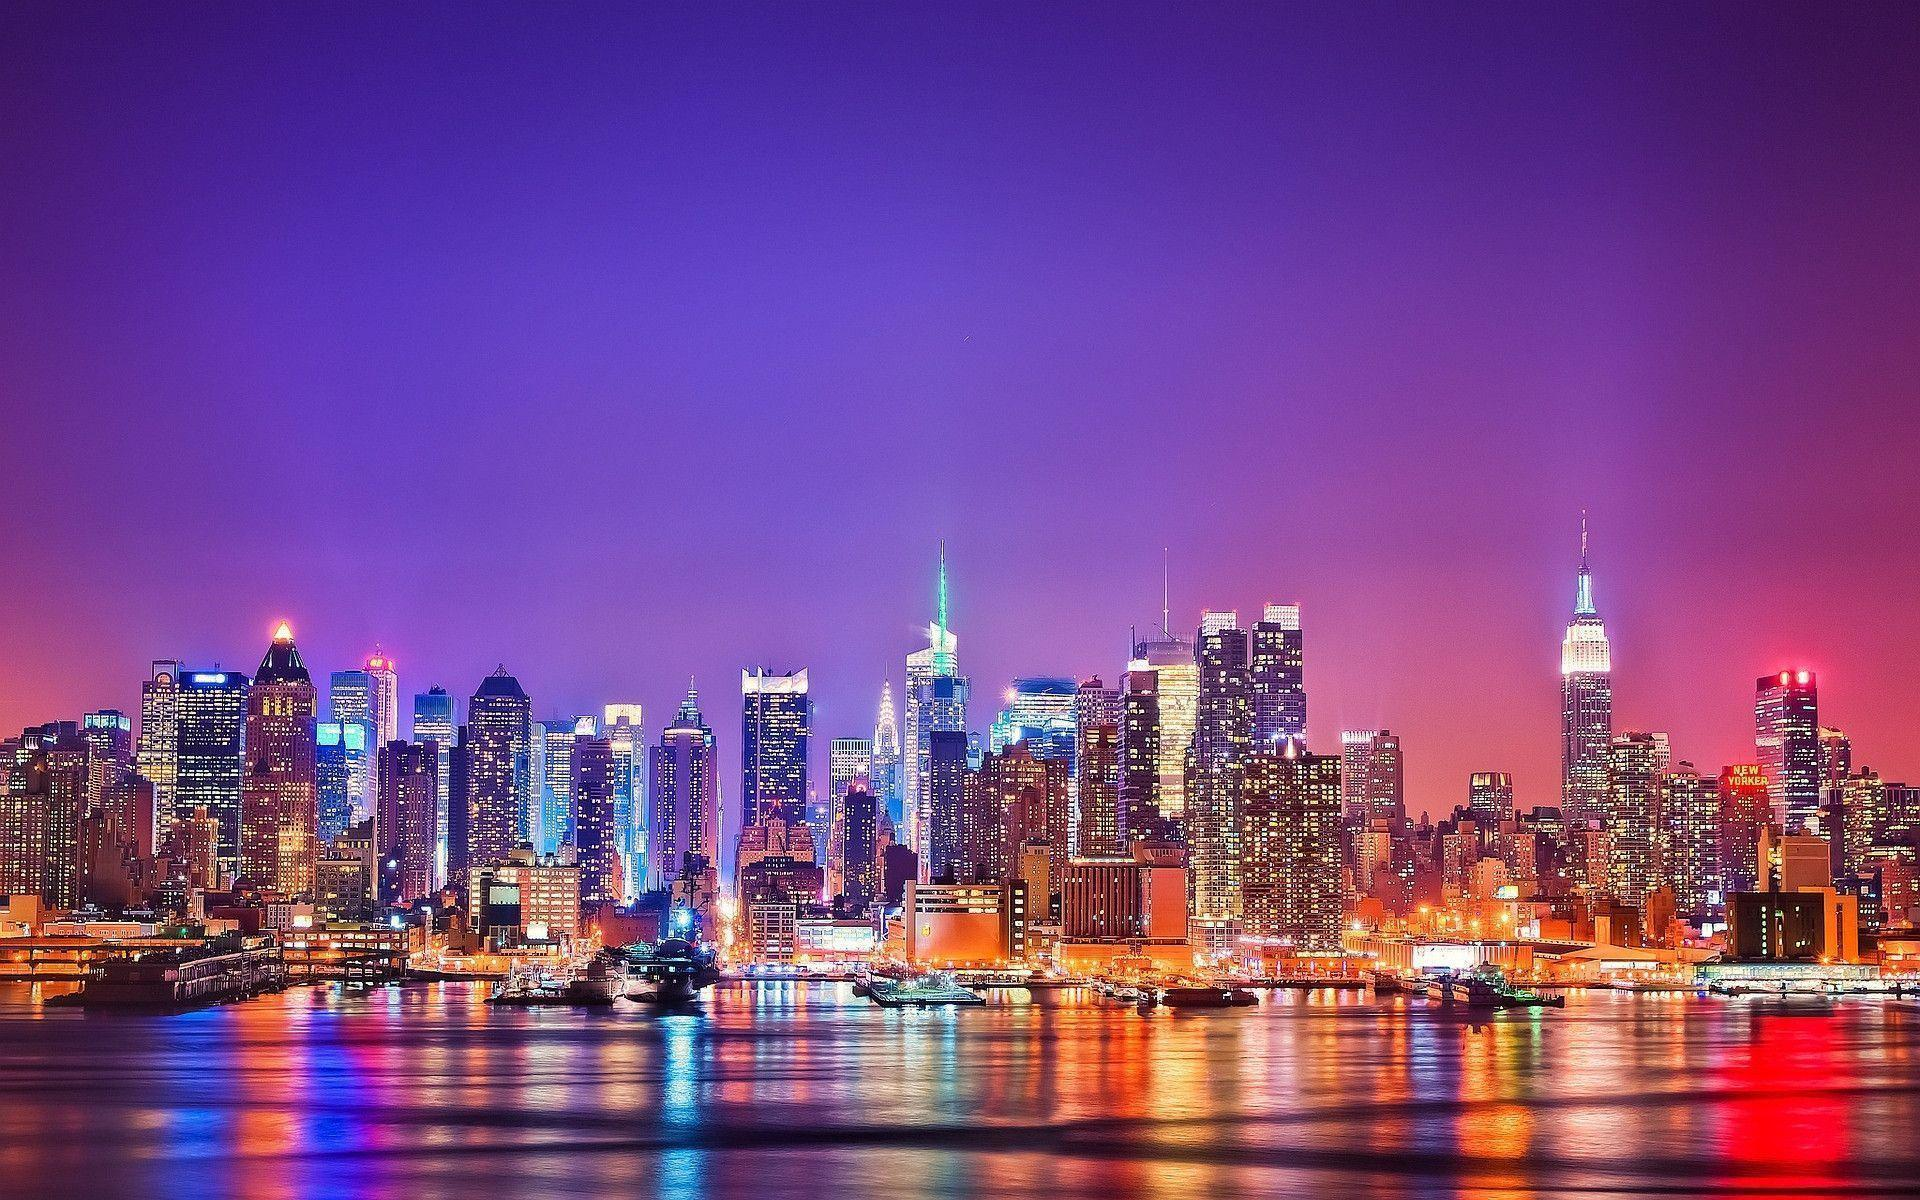 FunMozar – New York City Wallpapers